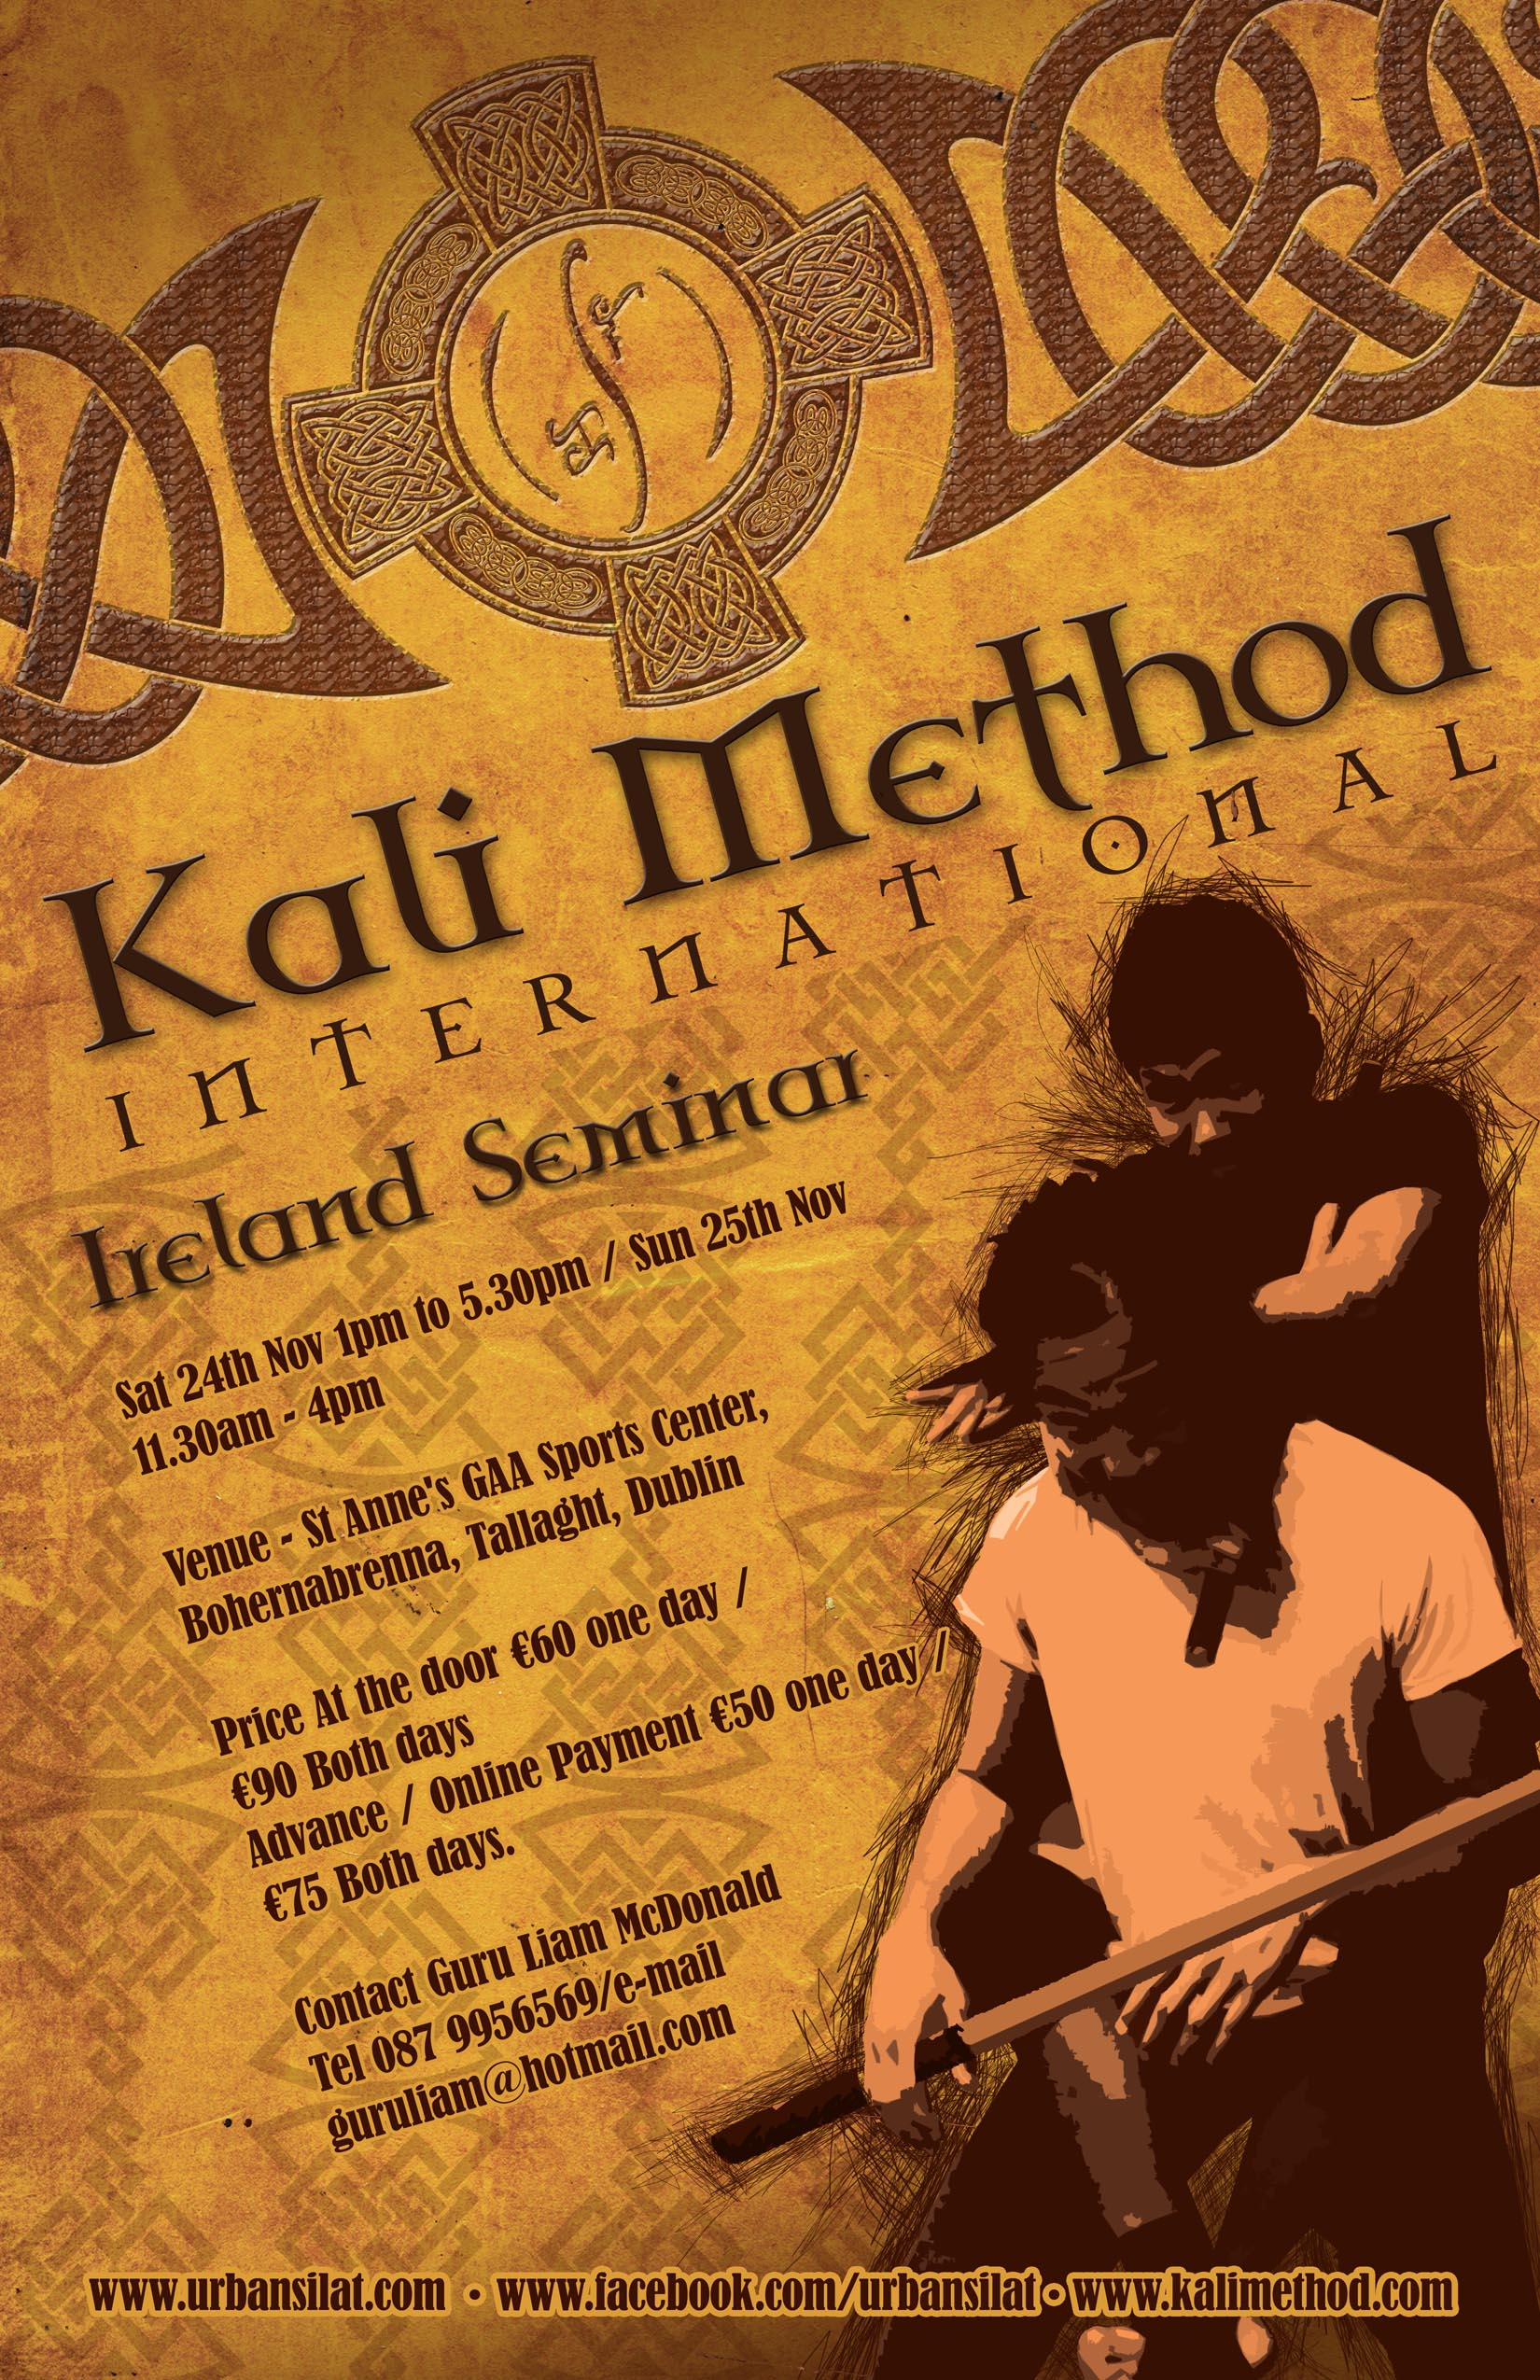 Ireland Flyer 11x17.jpg